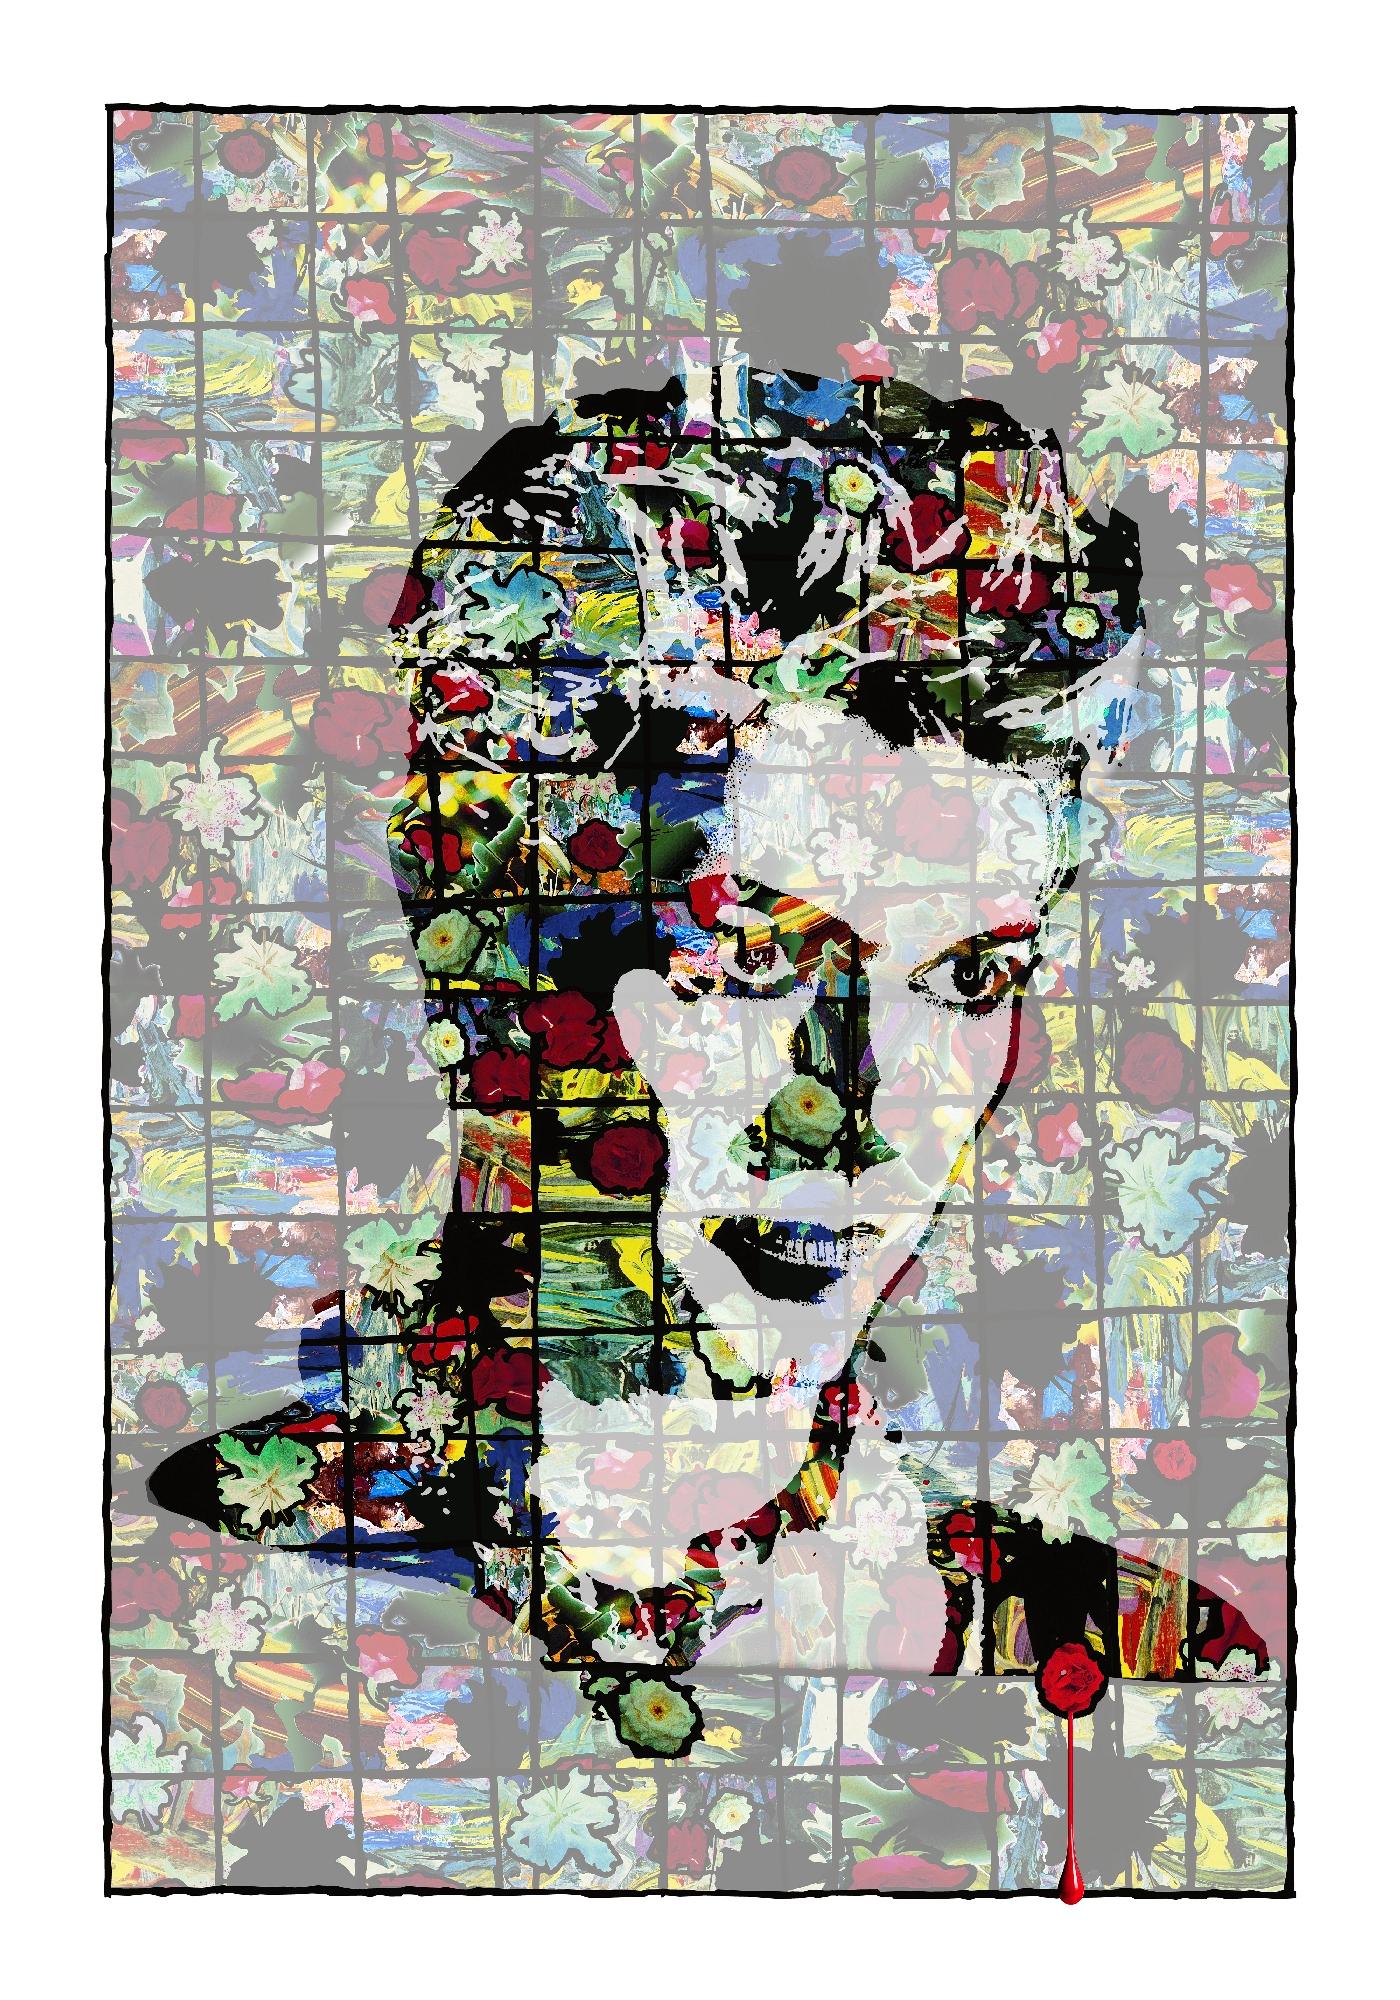 David Bowie Art Creation by Steve Stachin - Screaming Lord Byron 280cm x 400cm